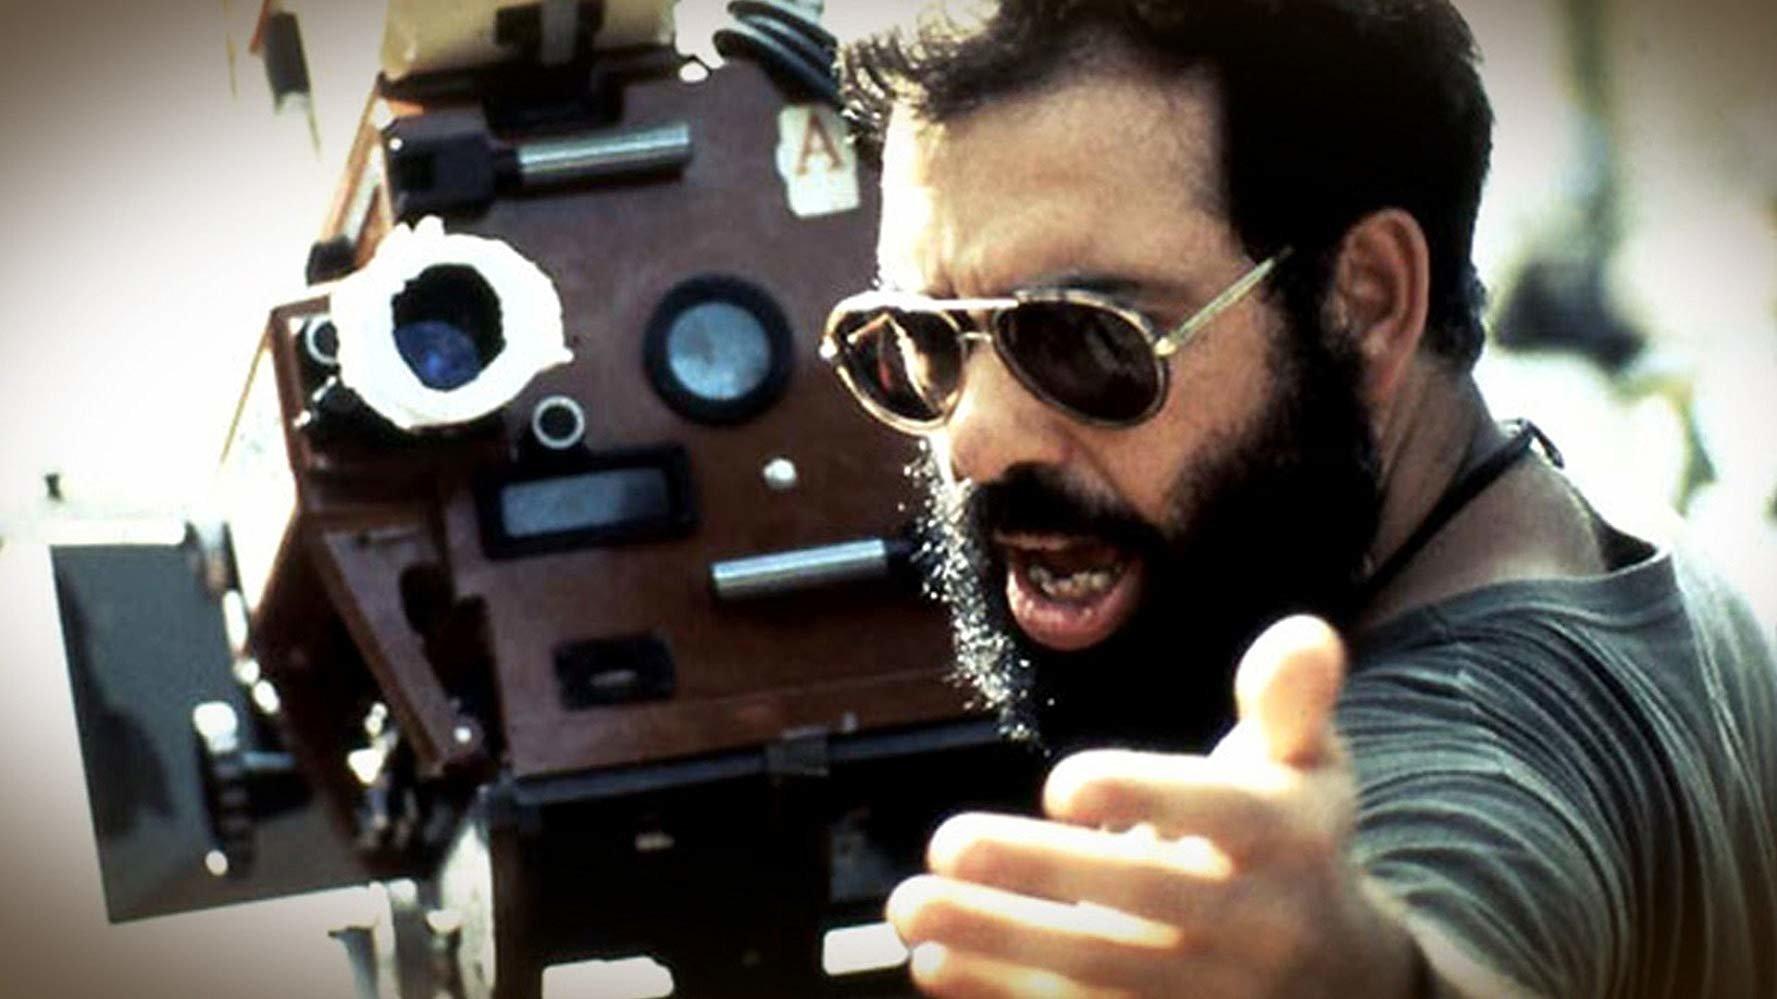 Mostra exibe clássicos de Francis Ford Coppola de